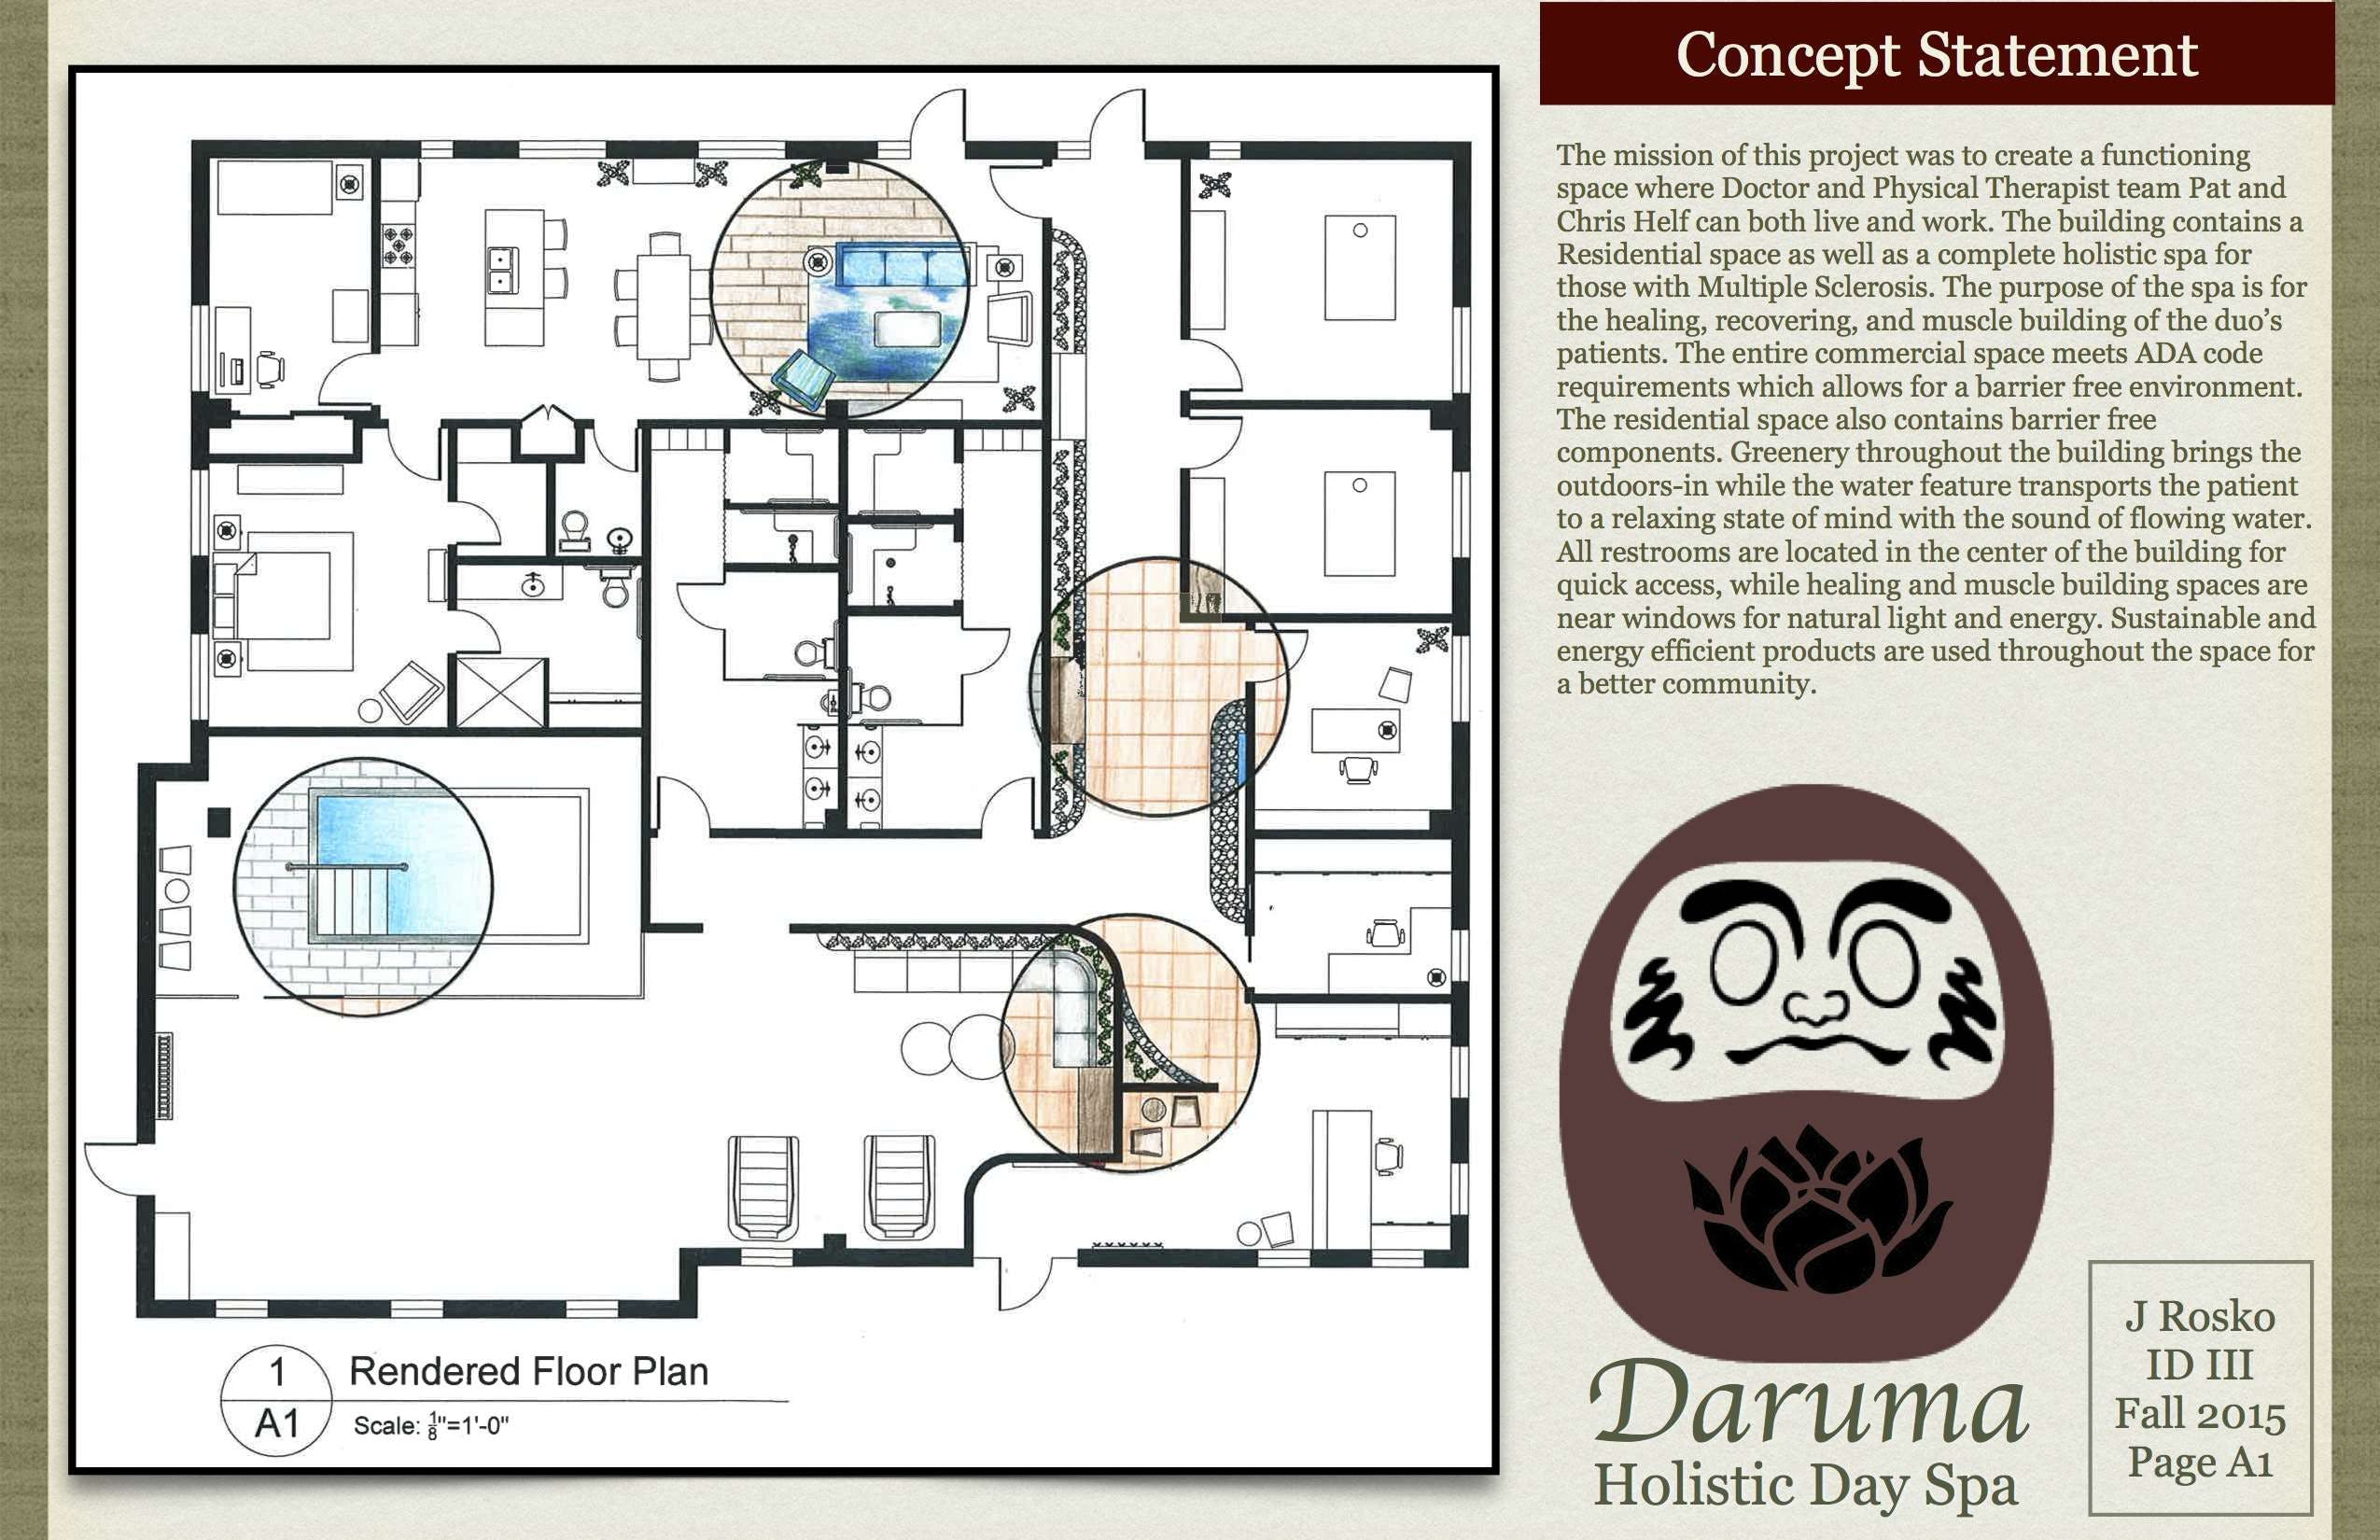 Daruma Holistic Day Spa- Commercial/Residential | Jessica